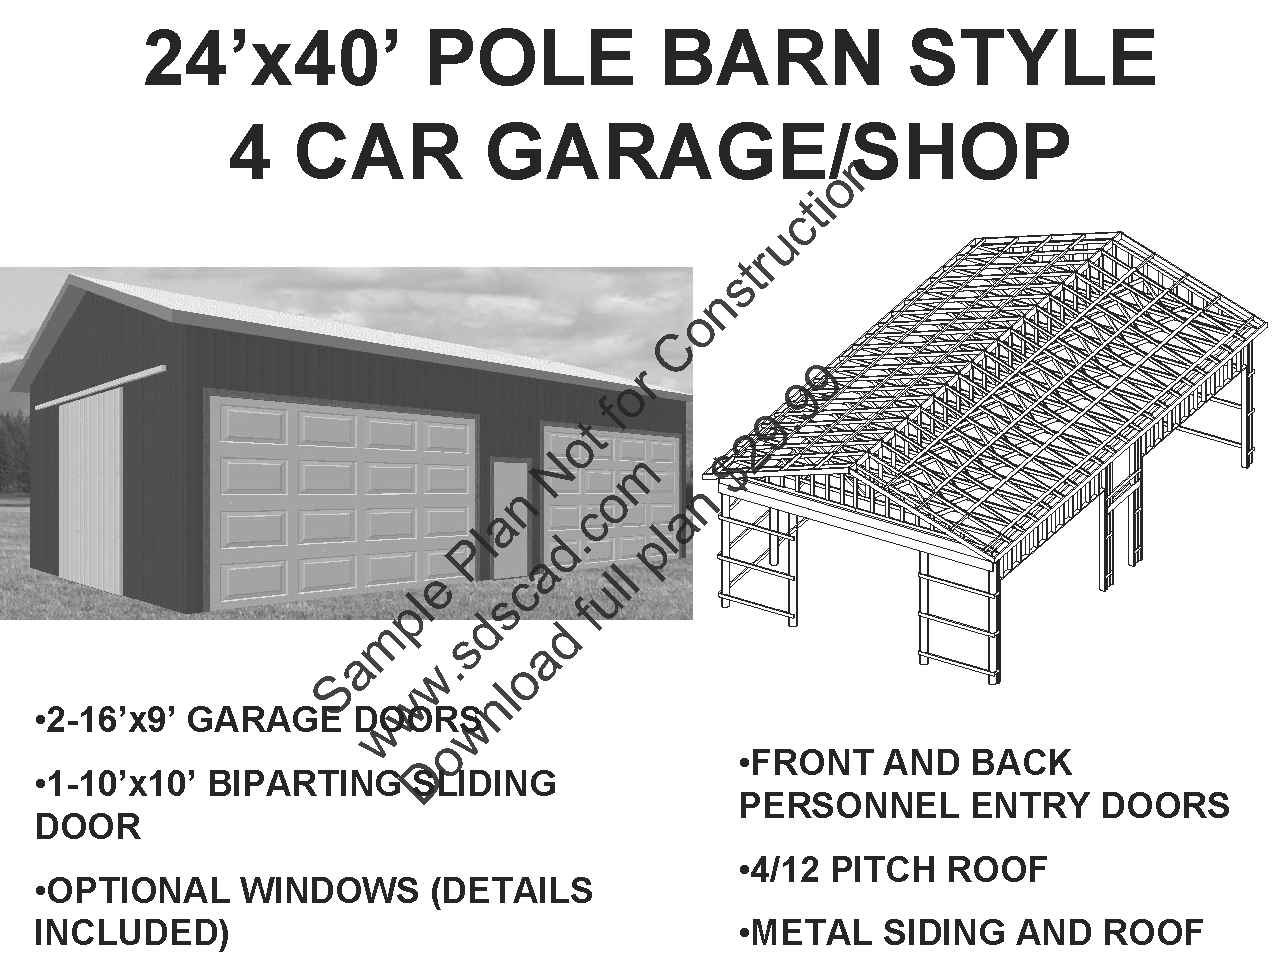 Pole Barn Plans Sds Plans Pole Barn Designs Pole Barn Plans